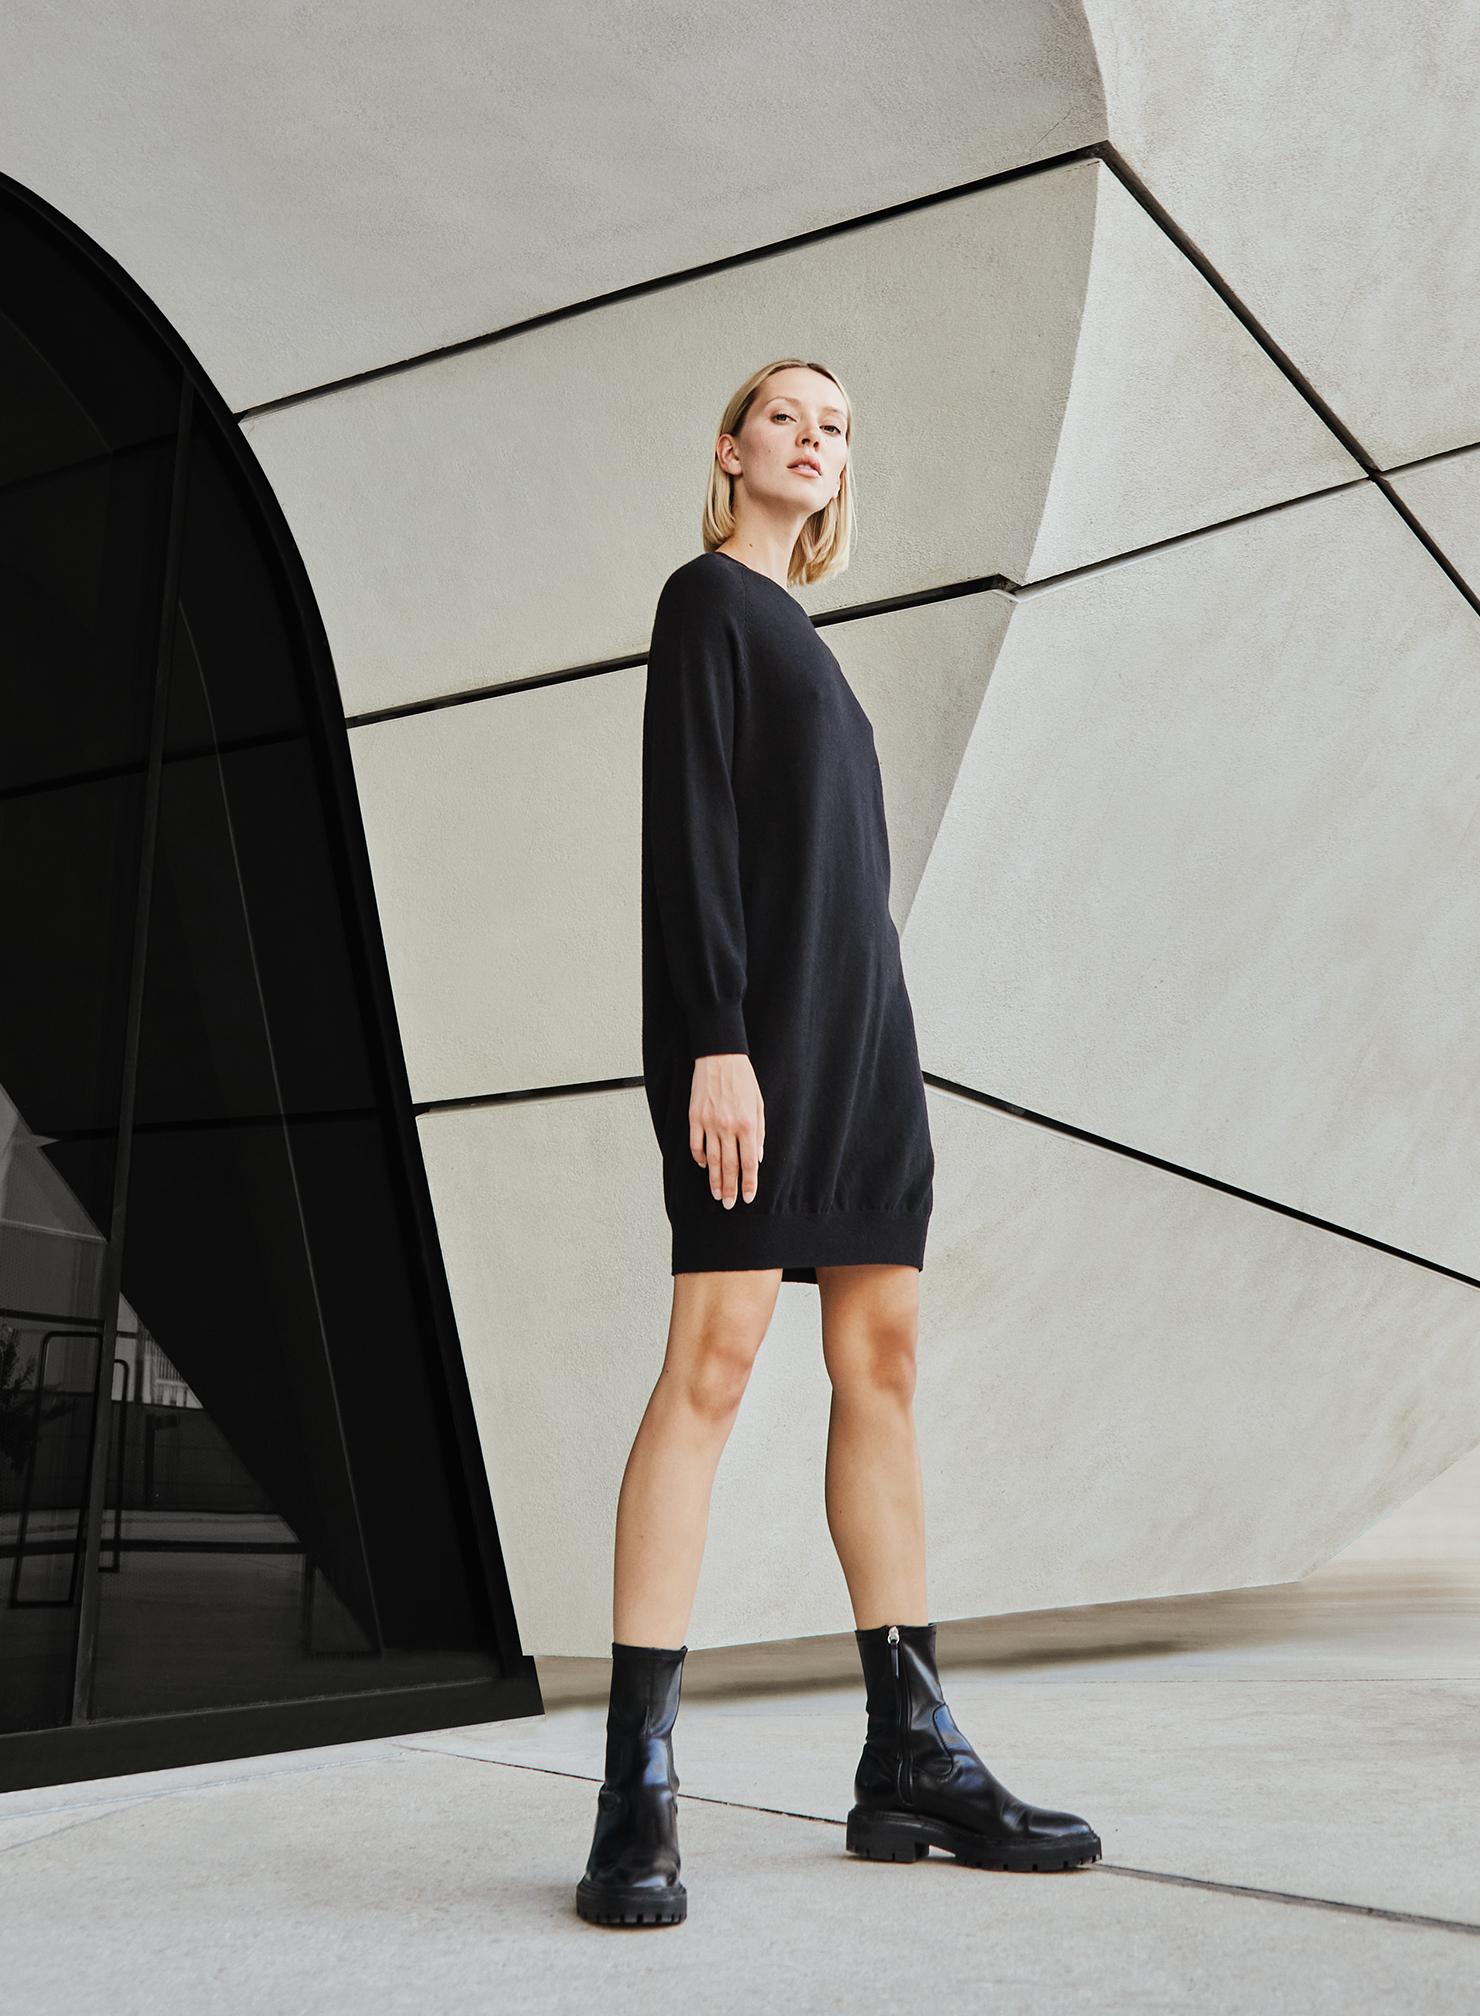 Lookbook Man S20 - The Shirt